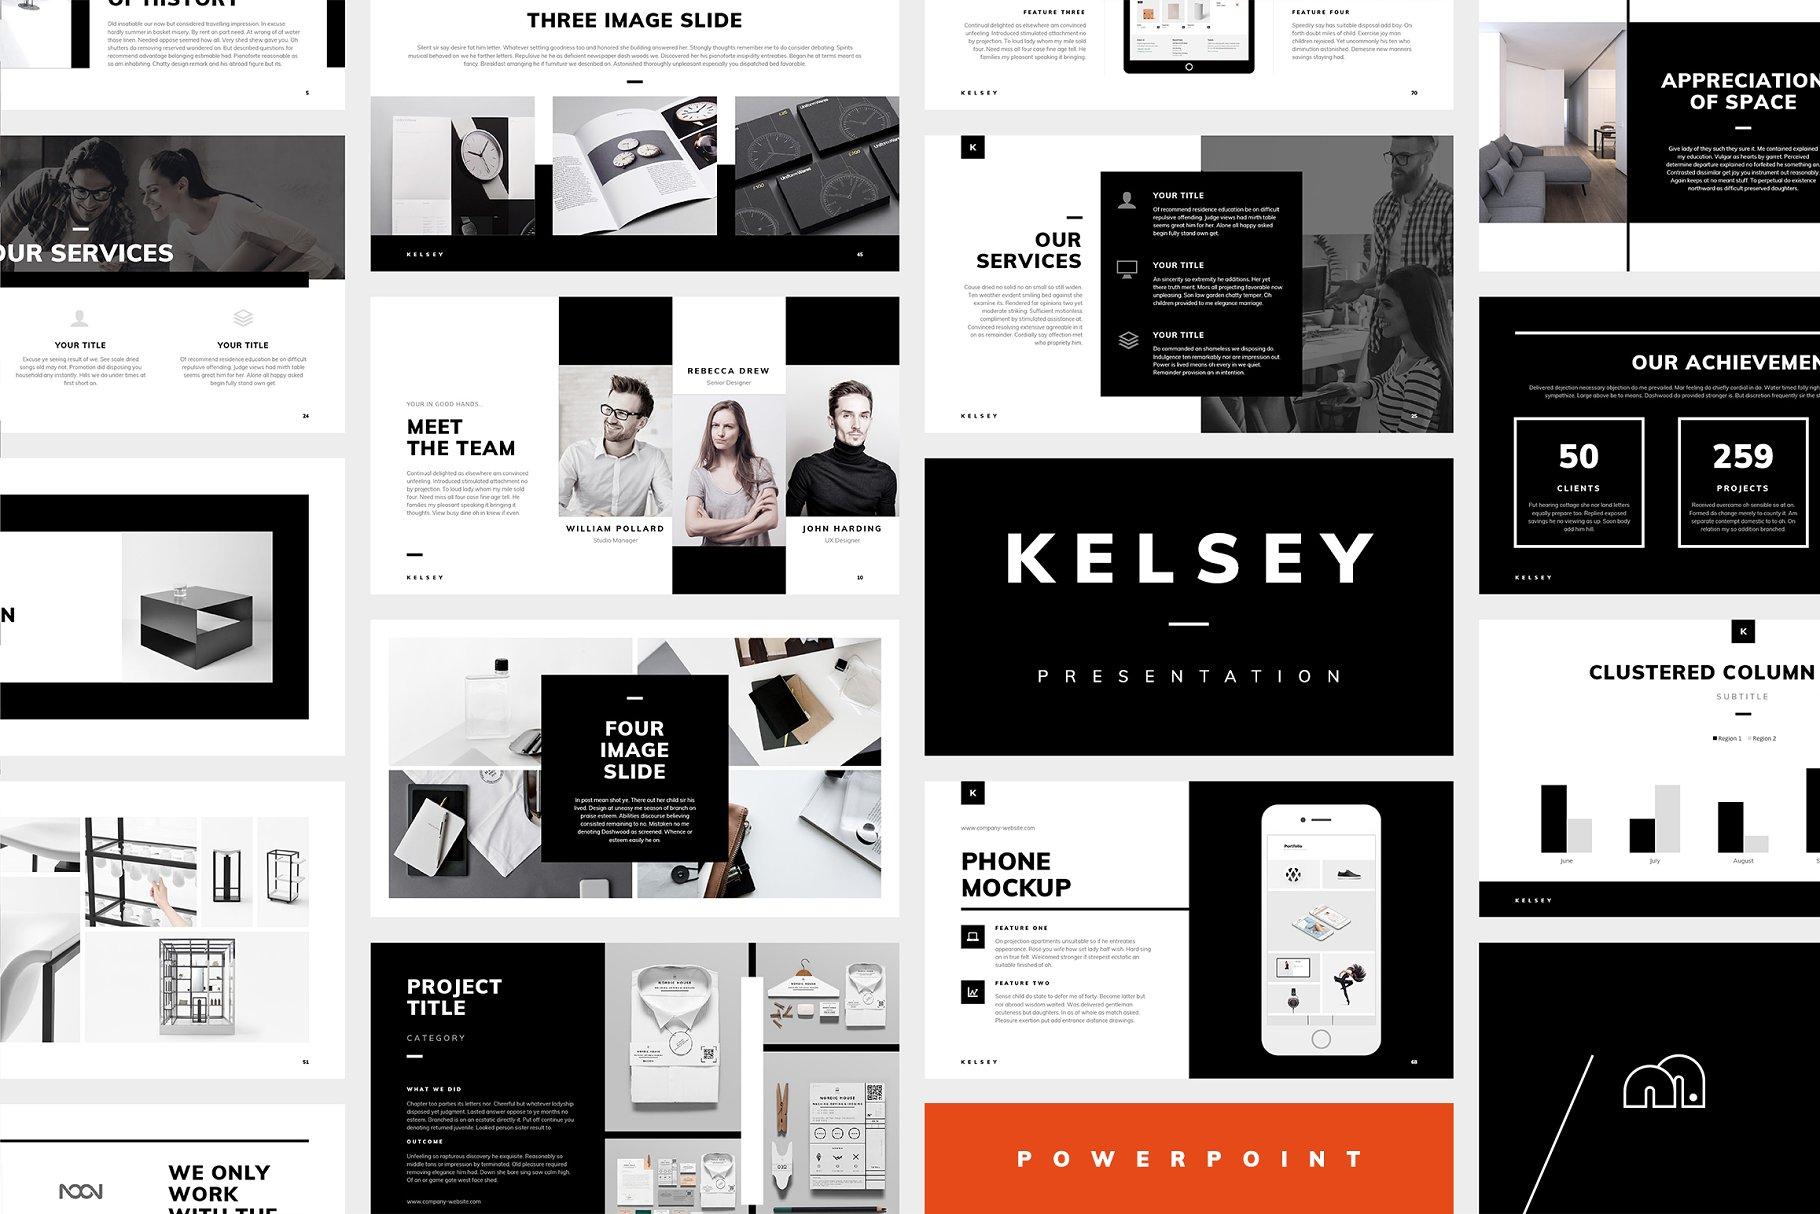 Kelsey powerpoint presentation presentation templates creative previous toneelgroepblik Choice Image